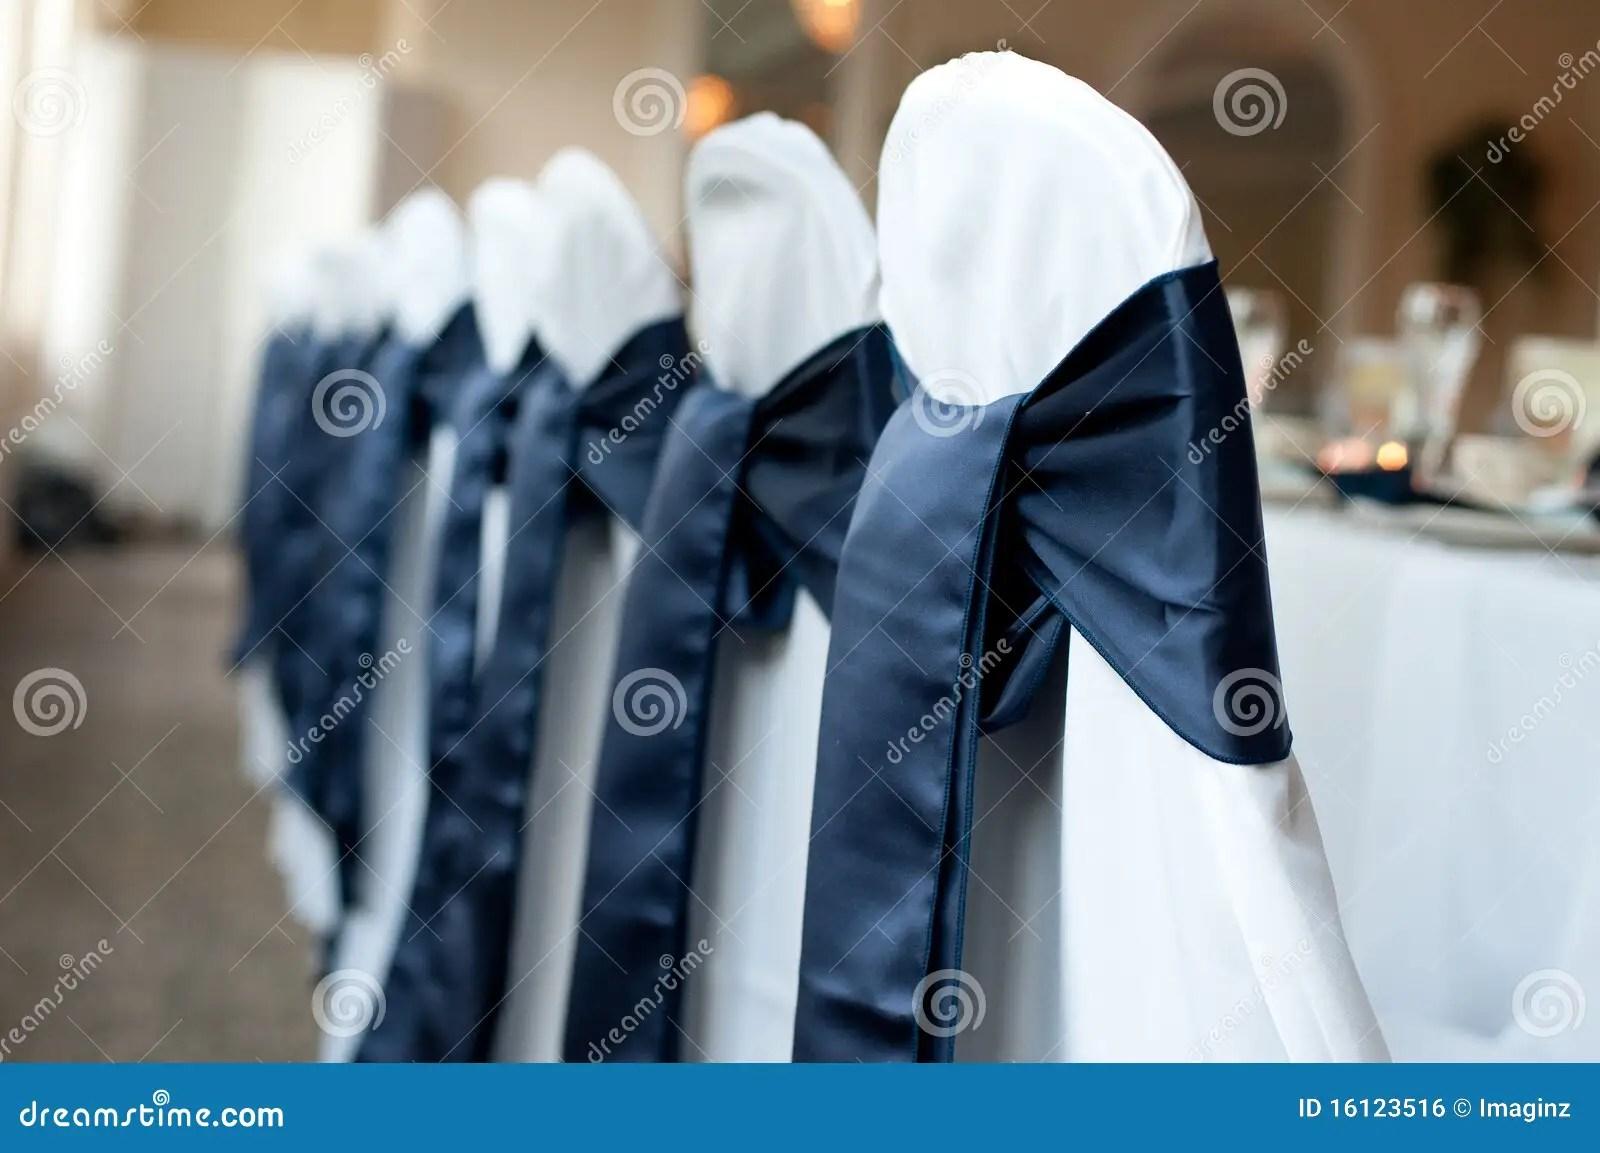 wedding chair covers tamworth replica mario bellini decorative stock photo image of silk